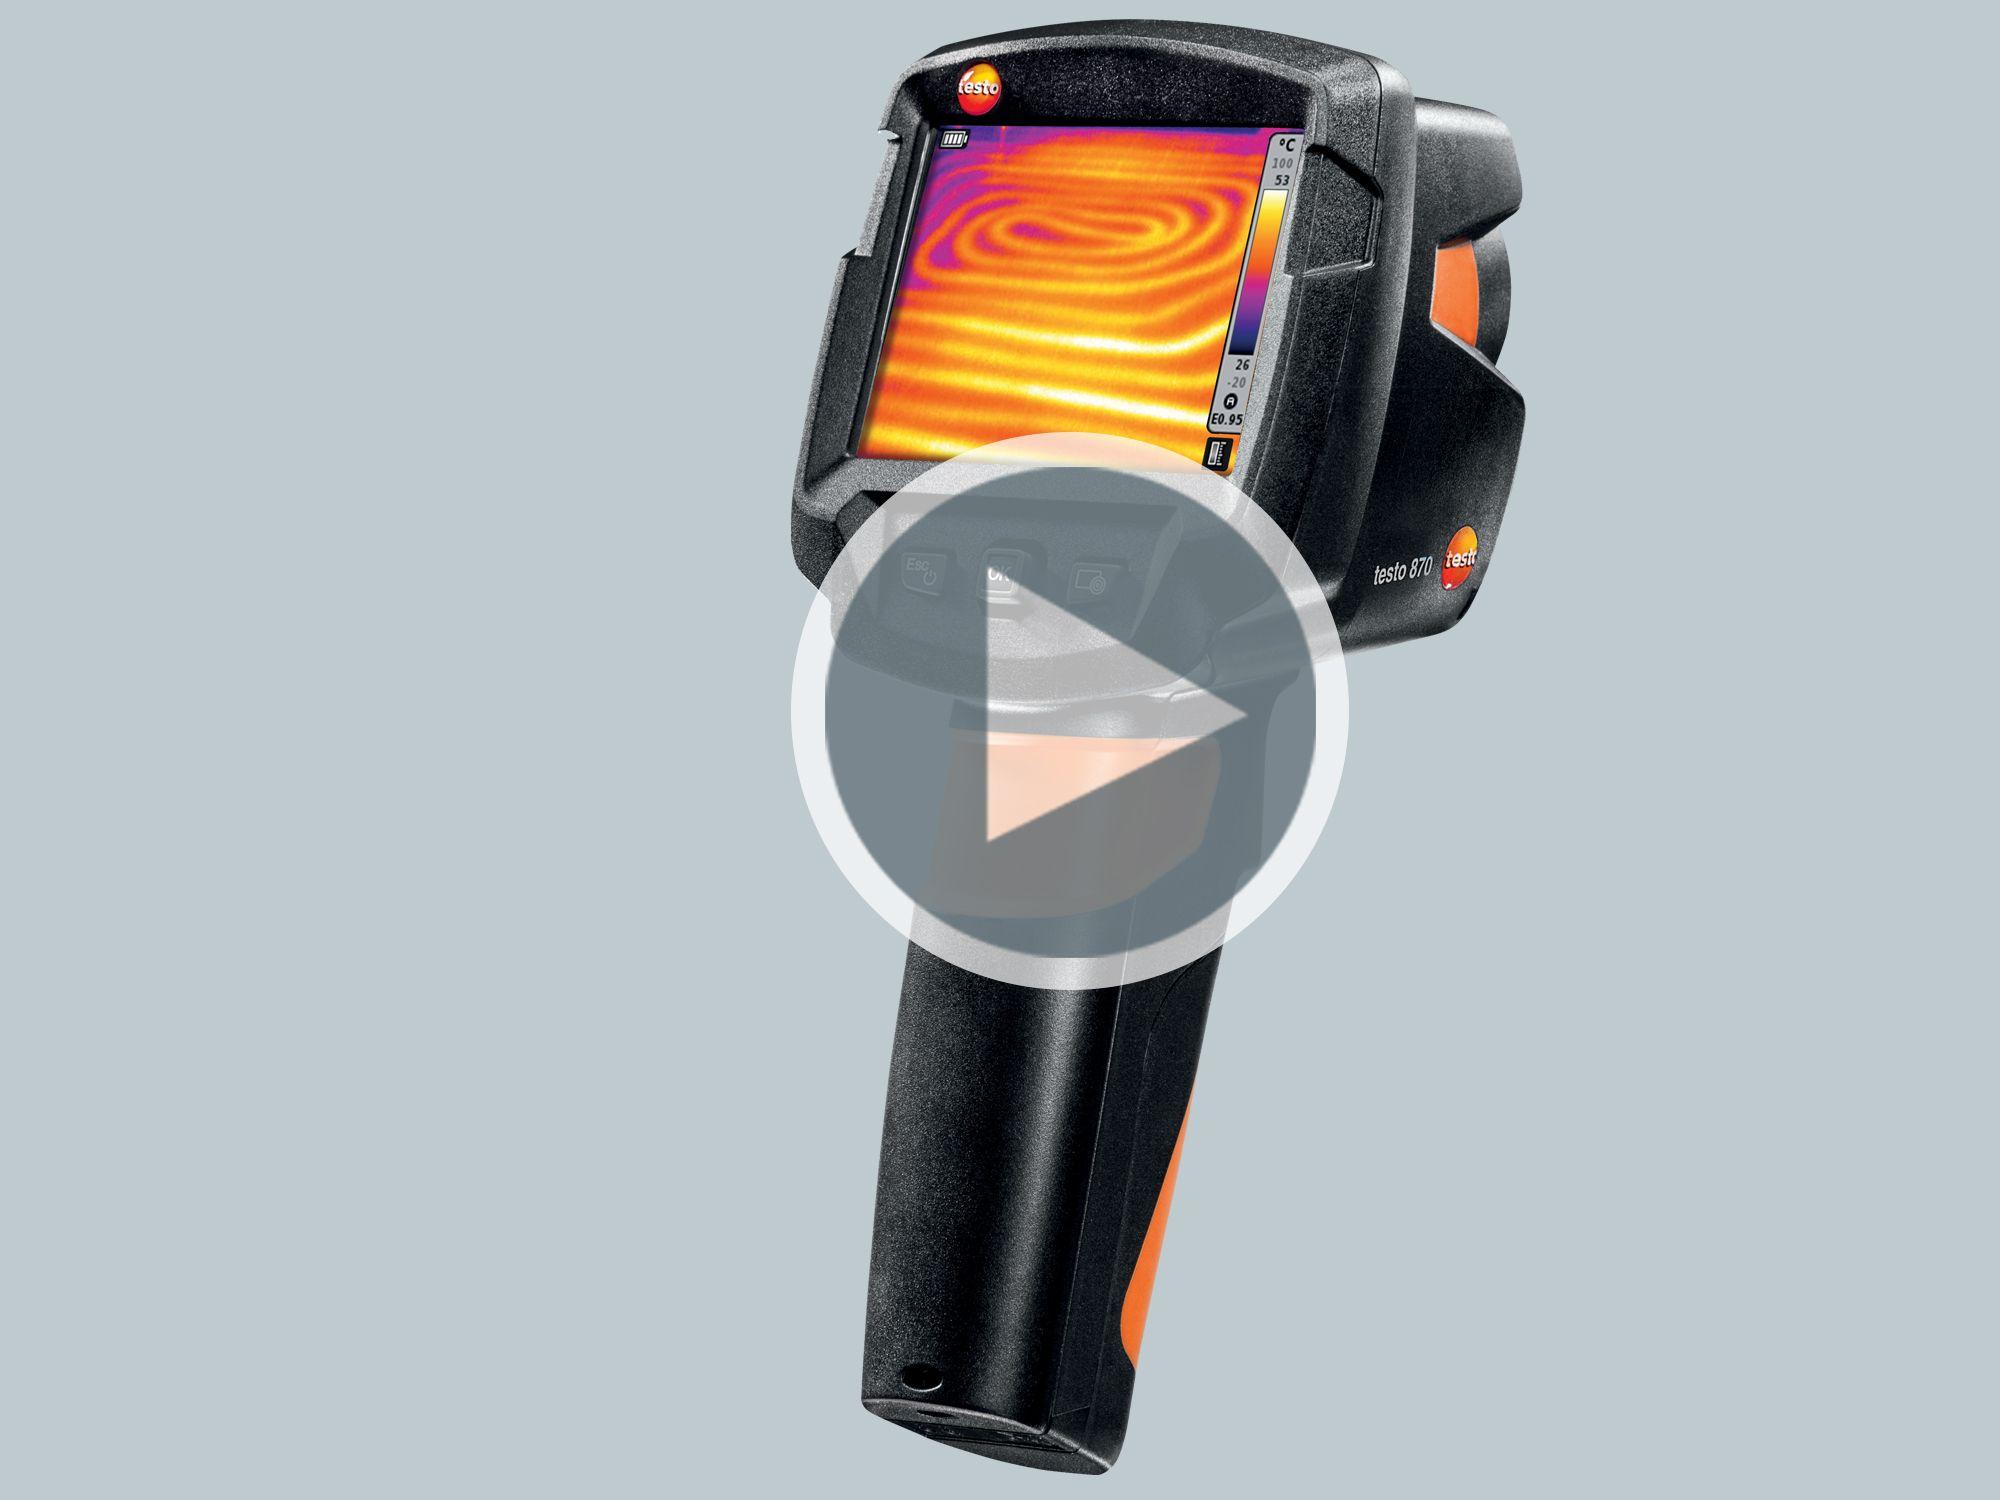 How-To Videos: testo 870